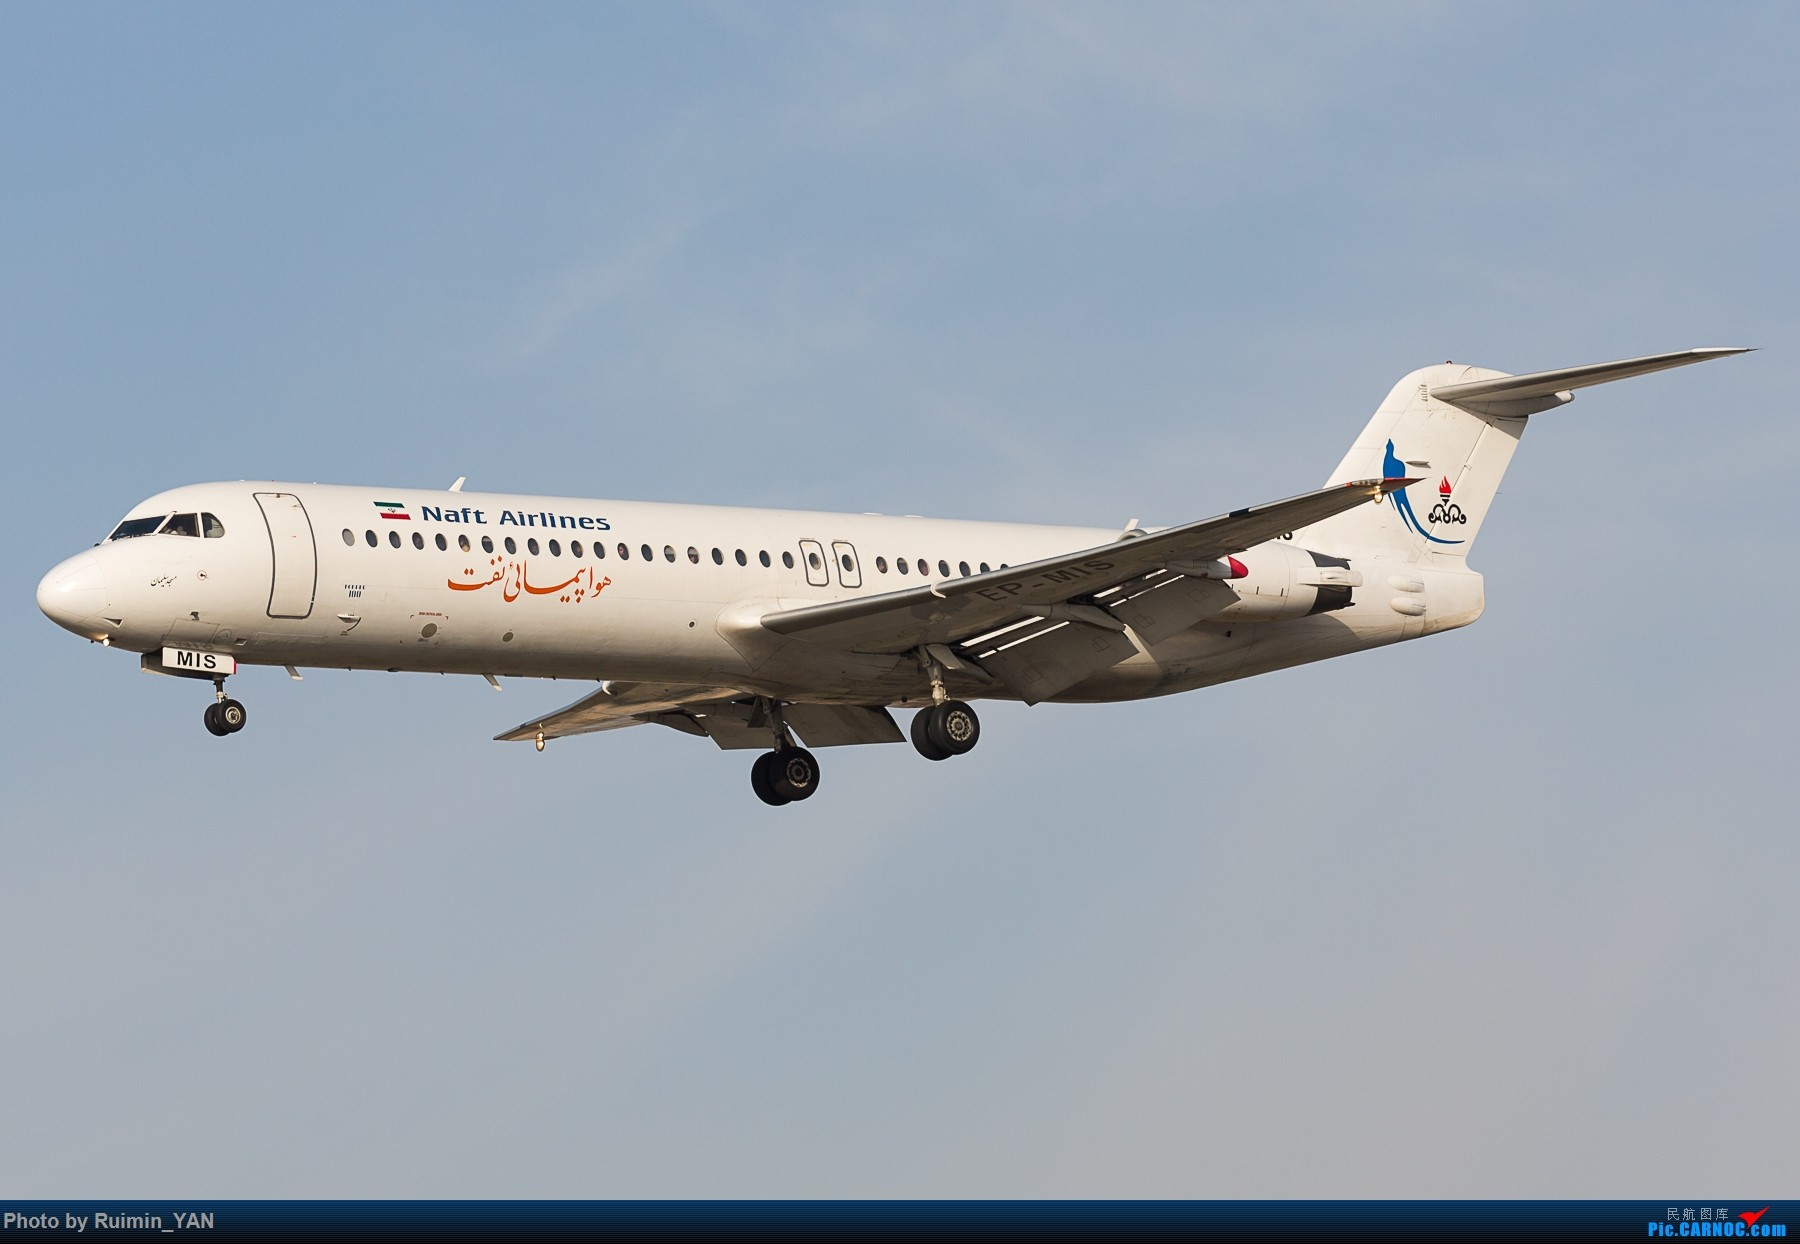 [原创]【THR】(德黑兰梅赫拉巴德机场)伊朗Naft航空(Iranian Naft Airlines,IRG)--福克100 FOKKER 100 EP-MIS 伊朗德黑兰机场